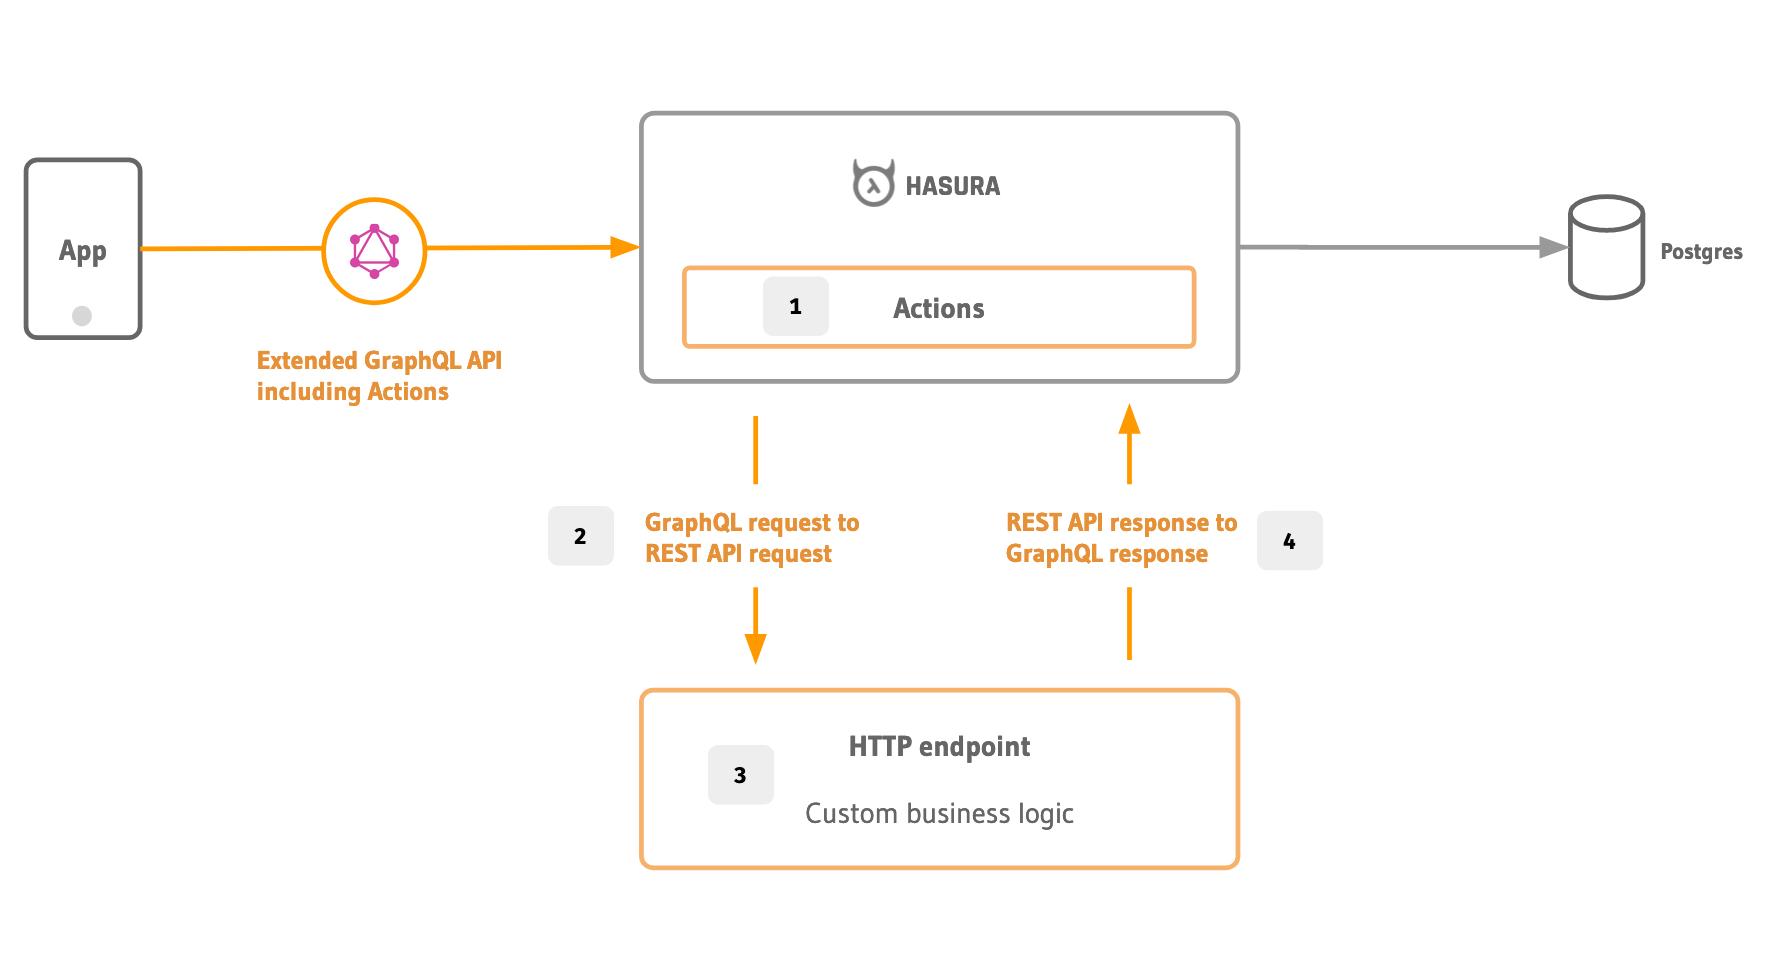 Introducing Actions: Add custom business logic to Hasura